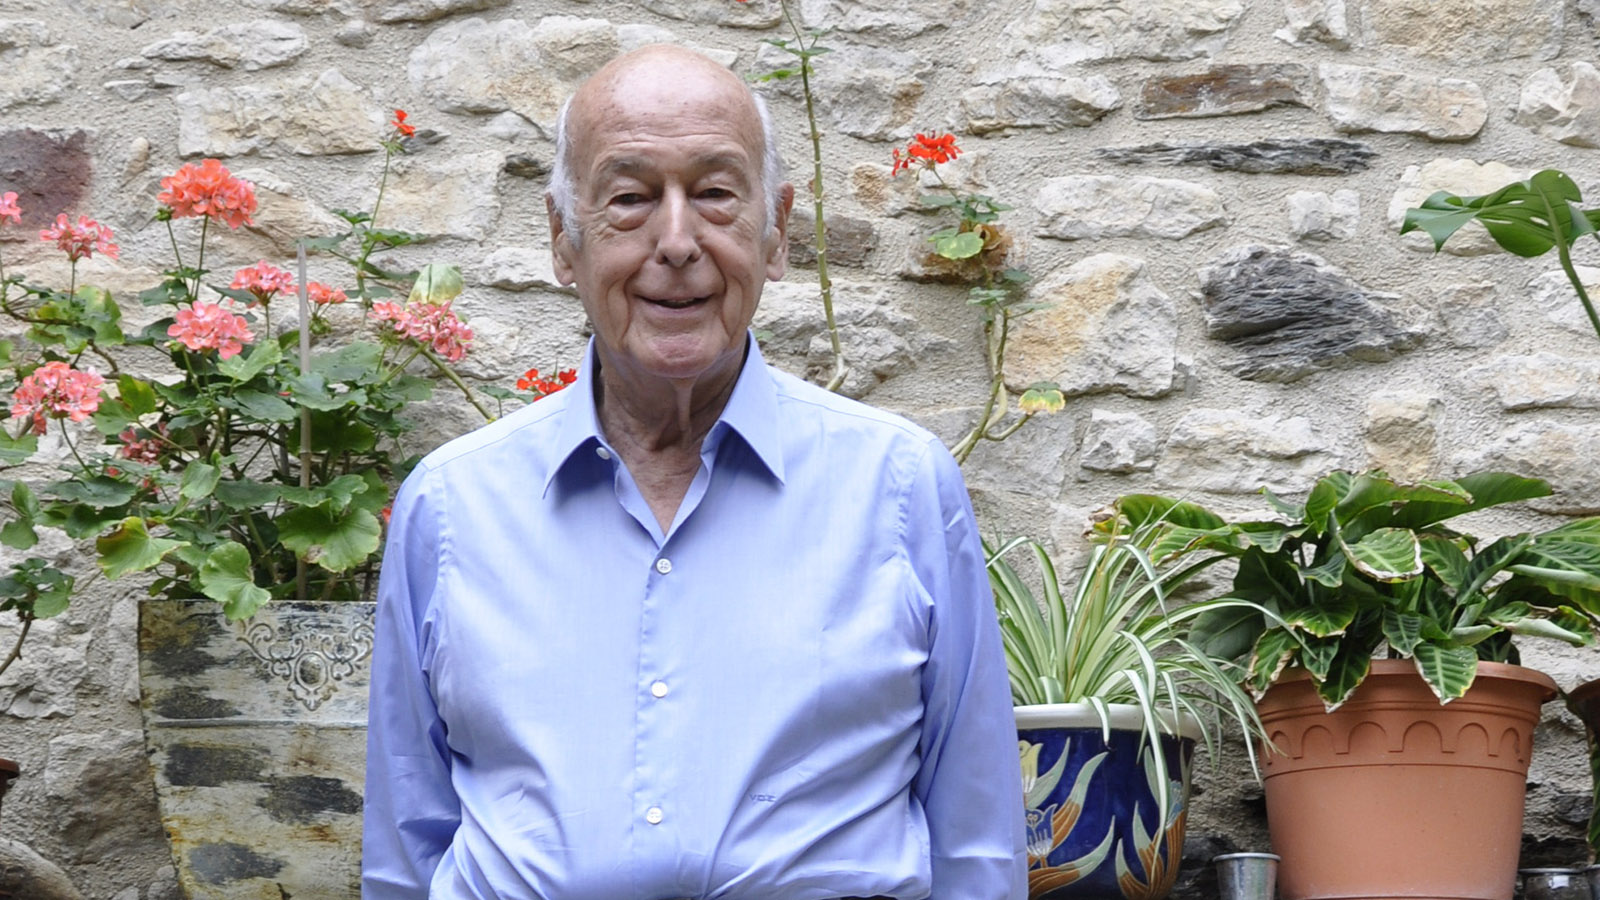 Giscard d'Estaing im Jahr 2010. Foto: Verena Jacqueline